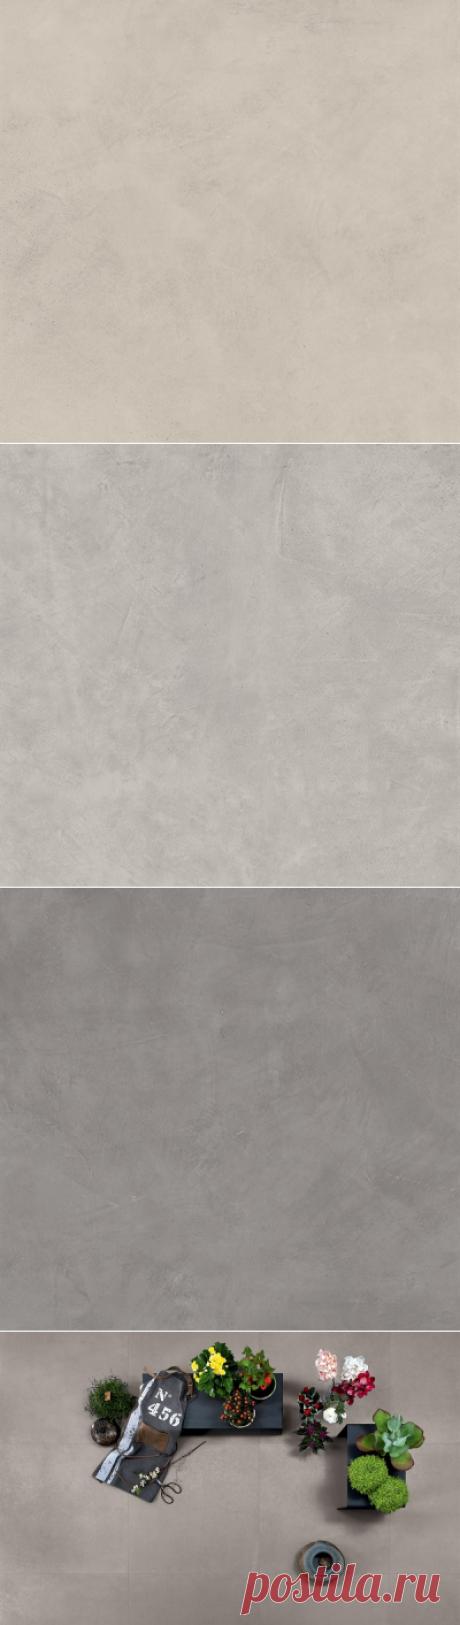 Kerlite Cement Project Размер: 1000х3000мм  Толщина: 5,5мм | Masterproff.ru